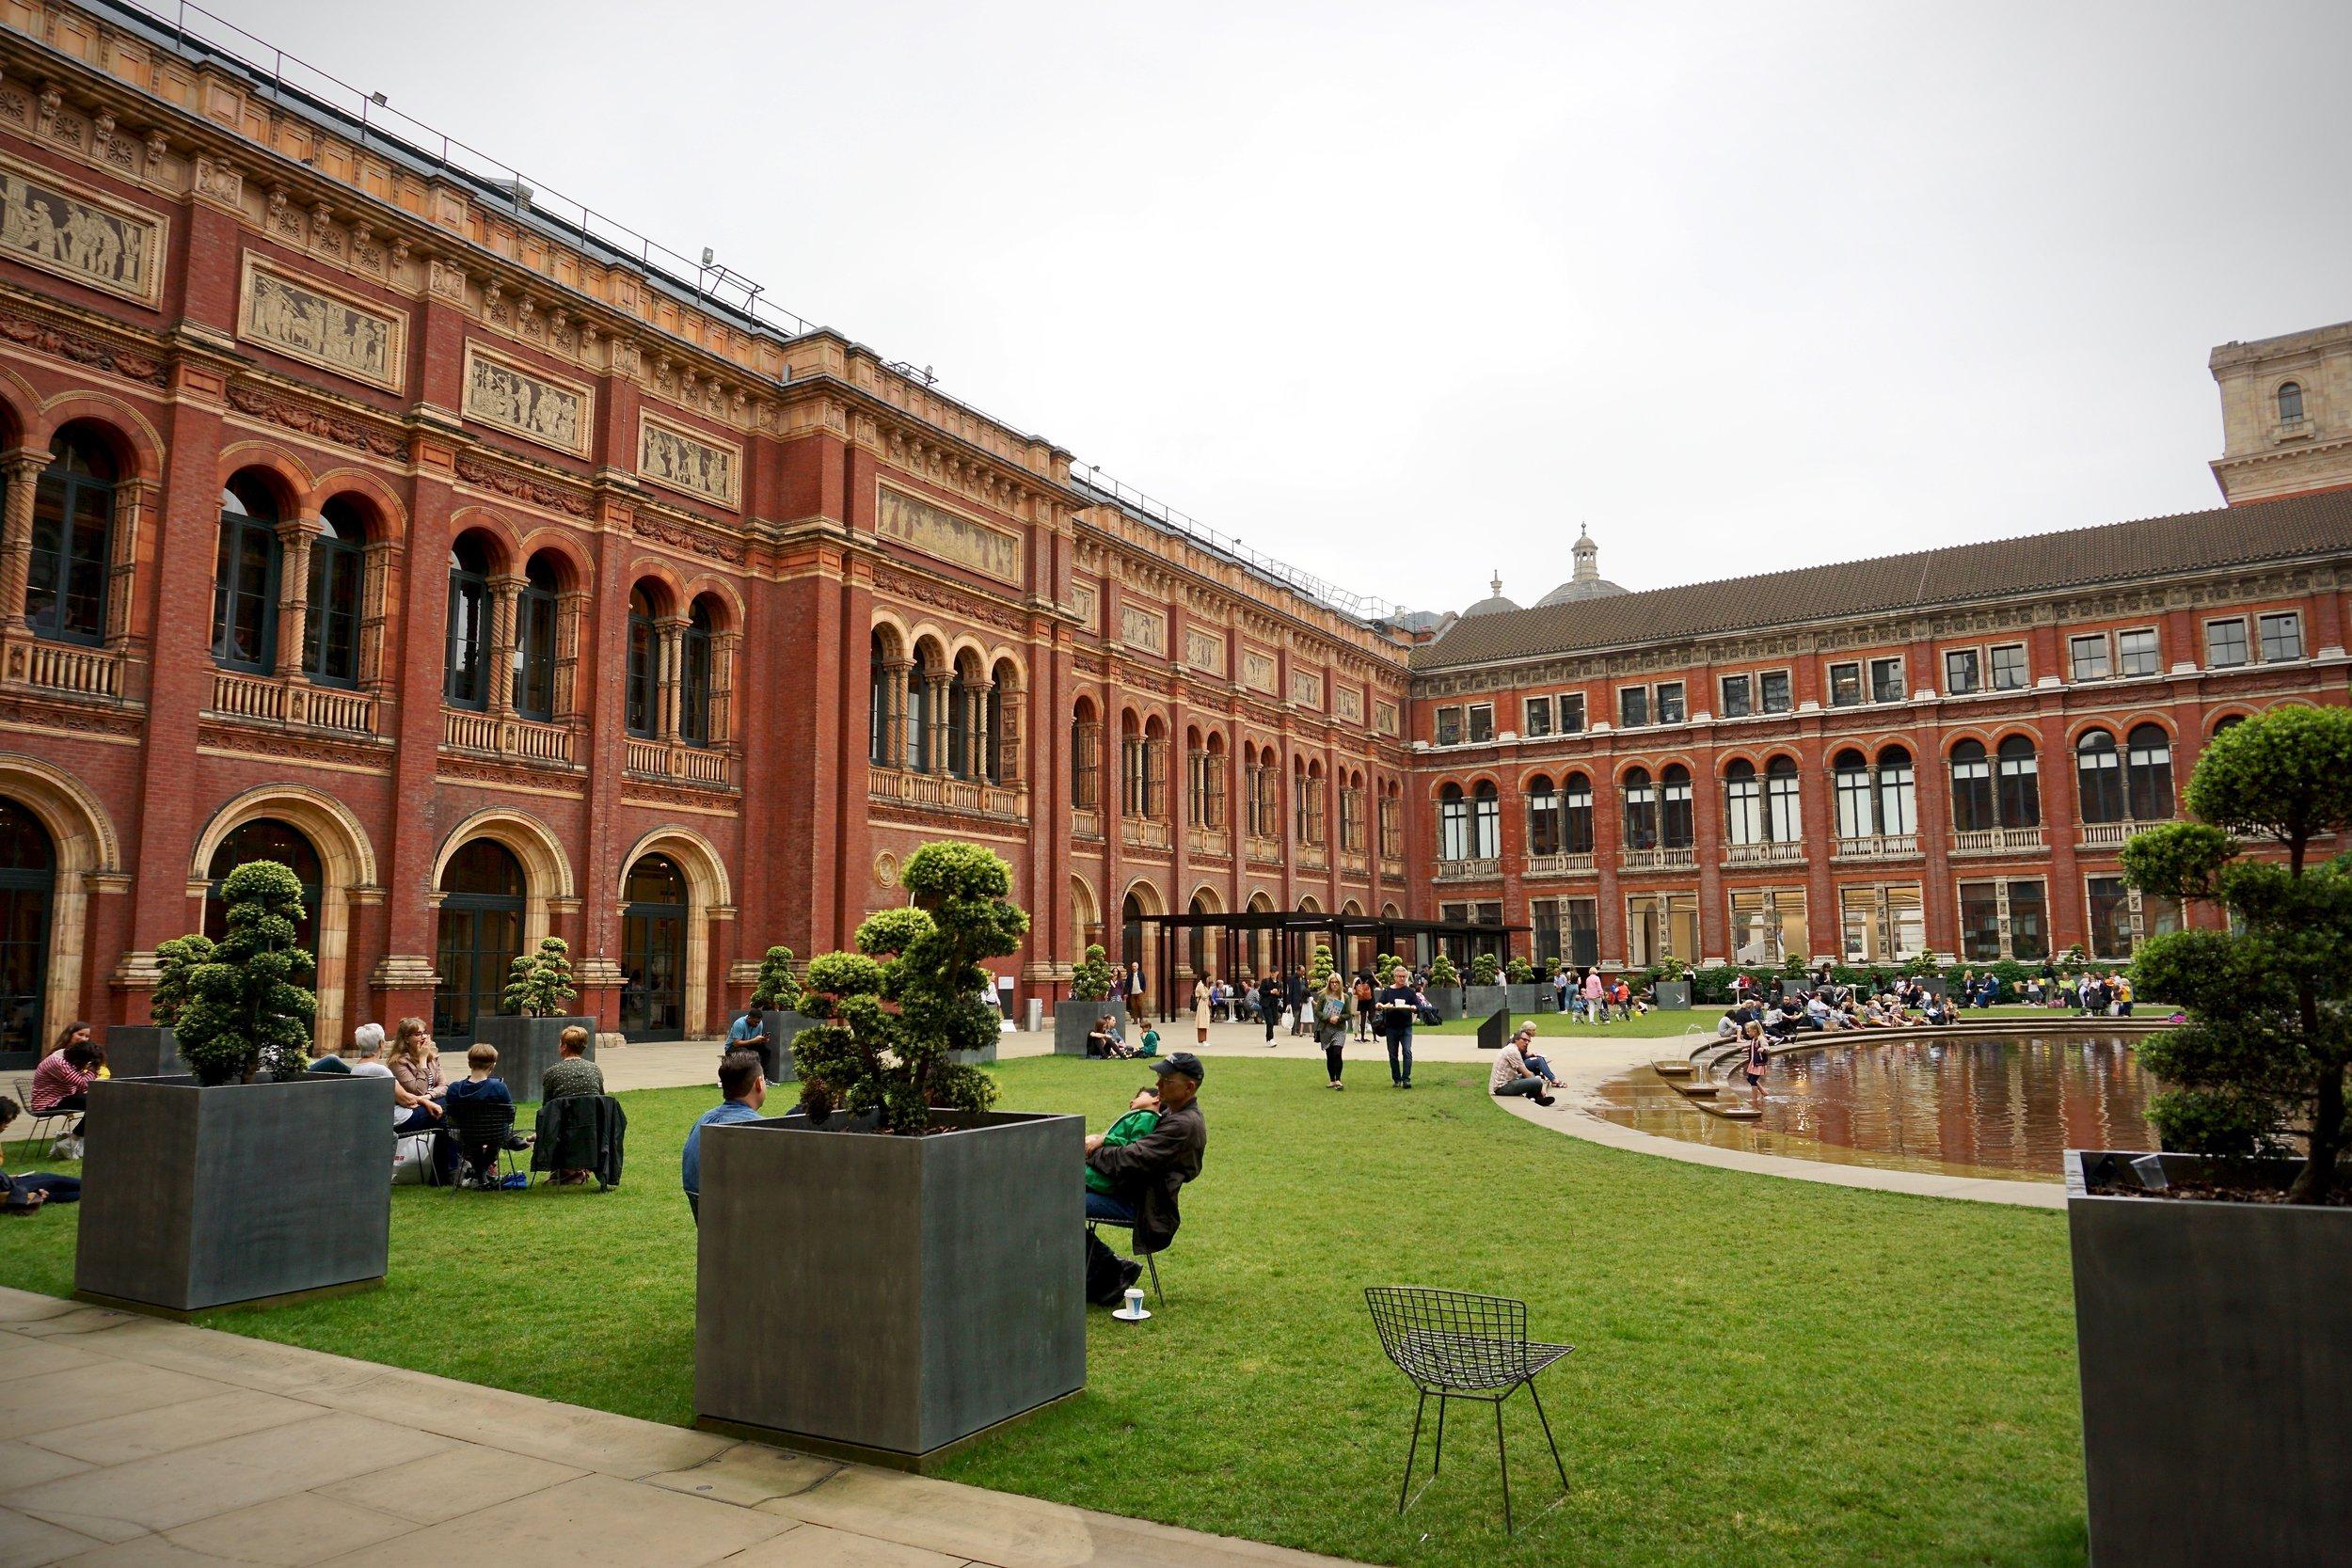 Courtyard of the Victoria & Albert Museum